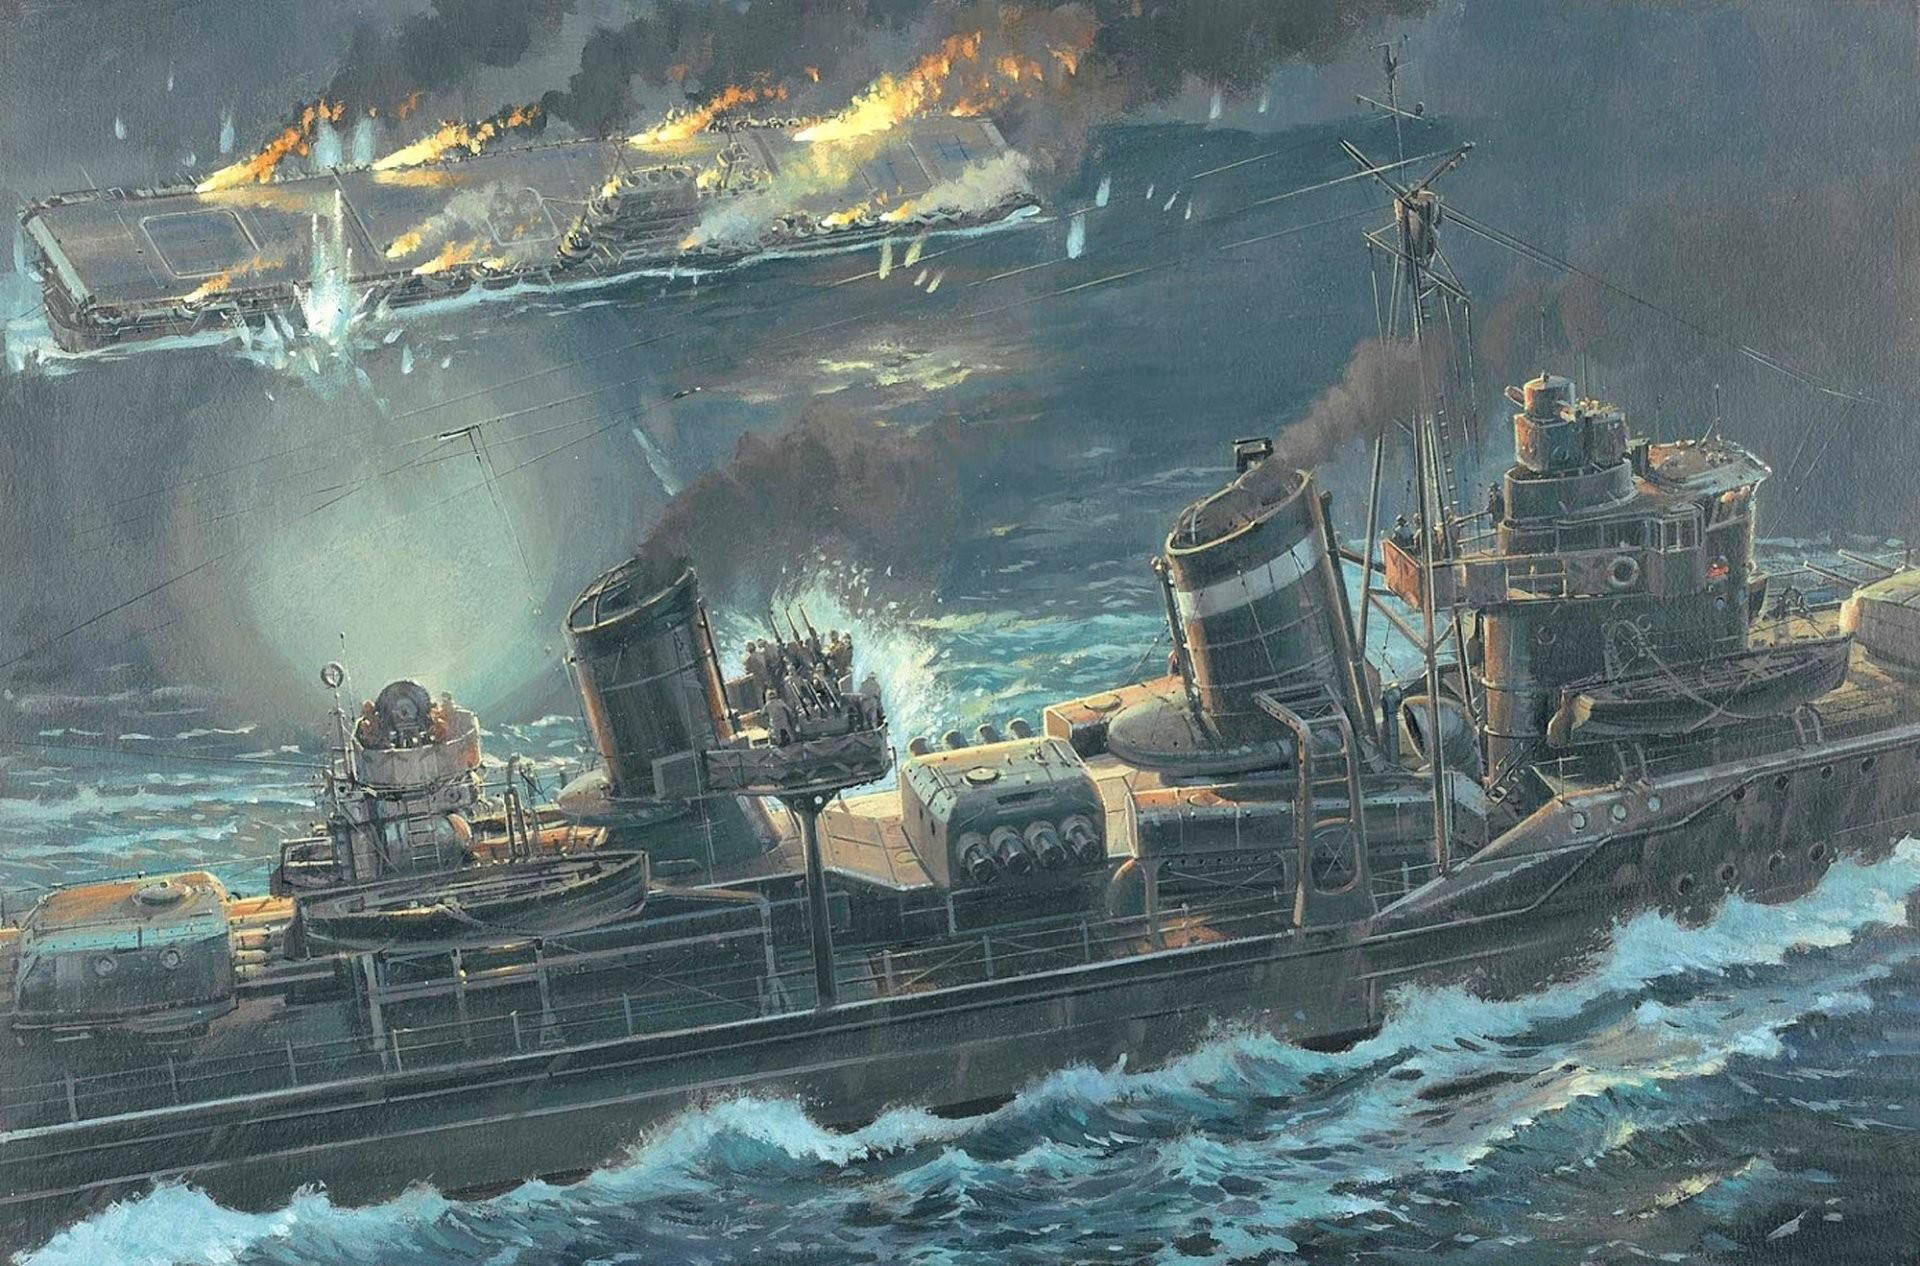 art battle of the santa cruz islands october 261942 drowning american  aircraft carrier